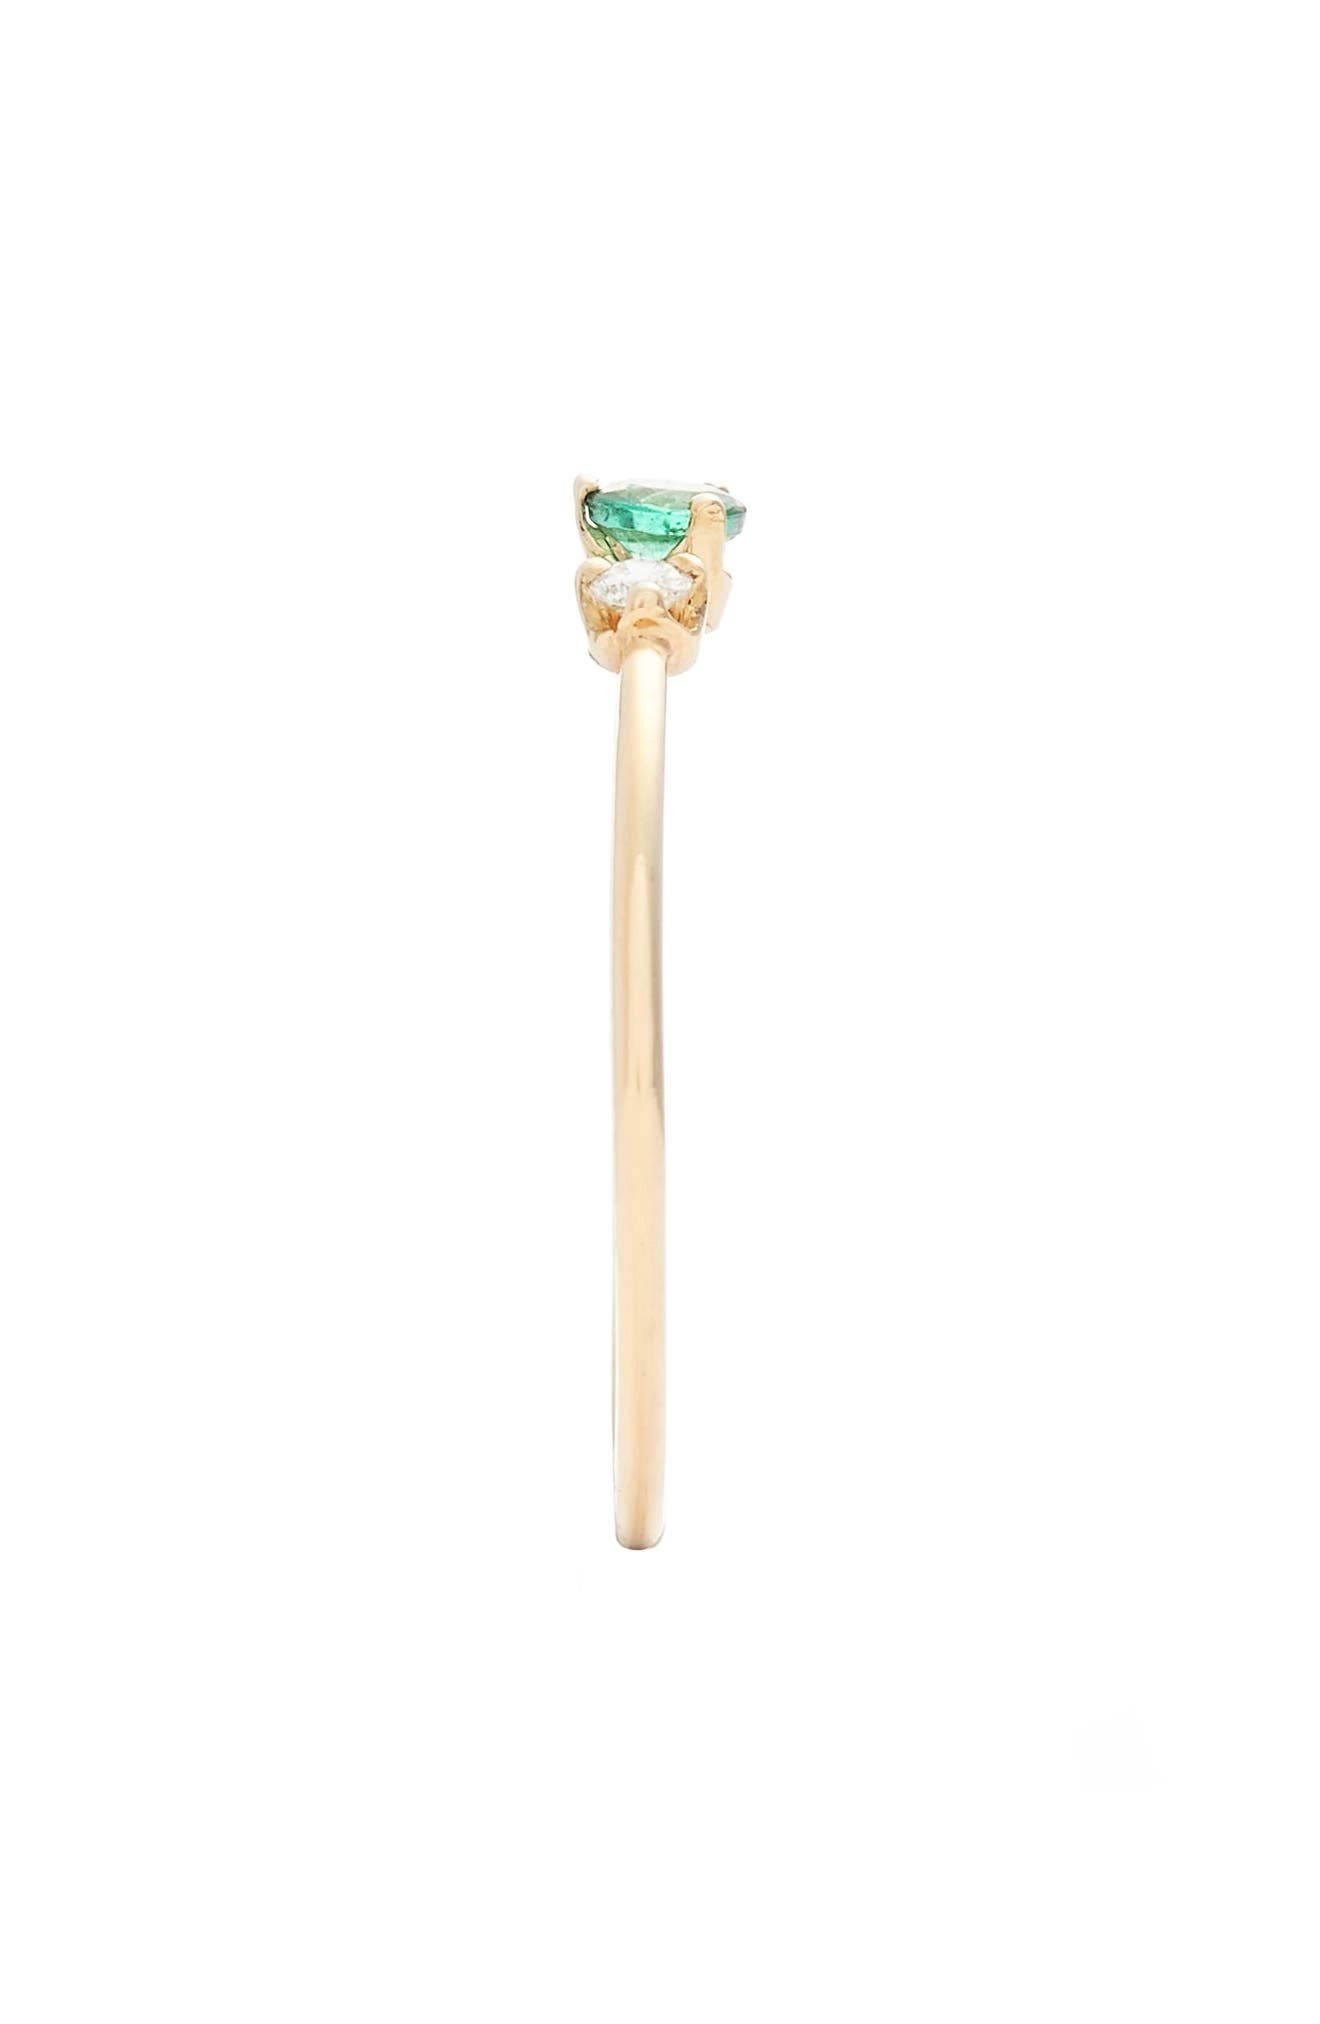 ZOË CHICCO, Emerald & Diamond Stack Ring, Alternate thumbnail 2, color, YELLOW GOLD/ EMERALD